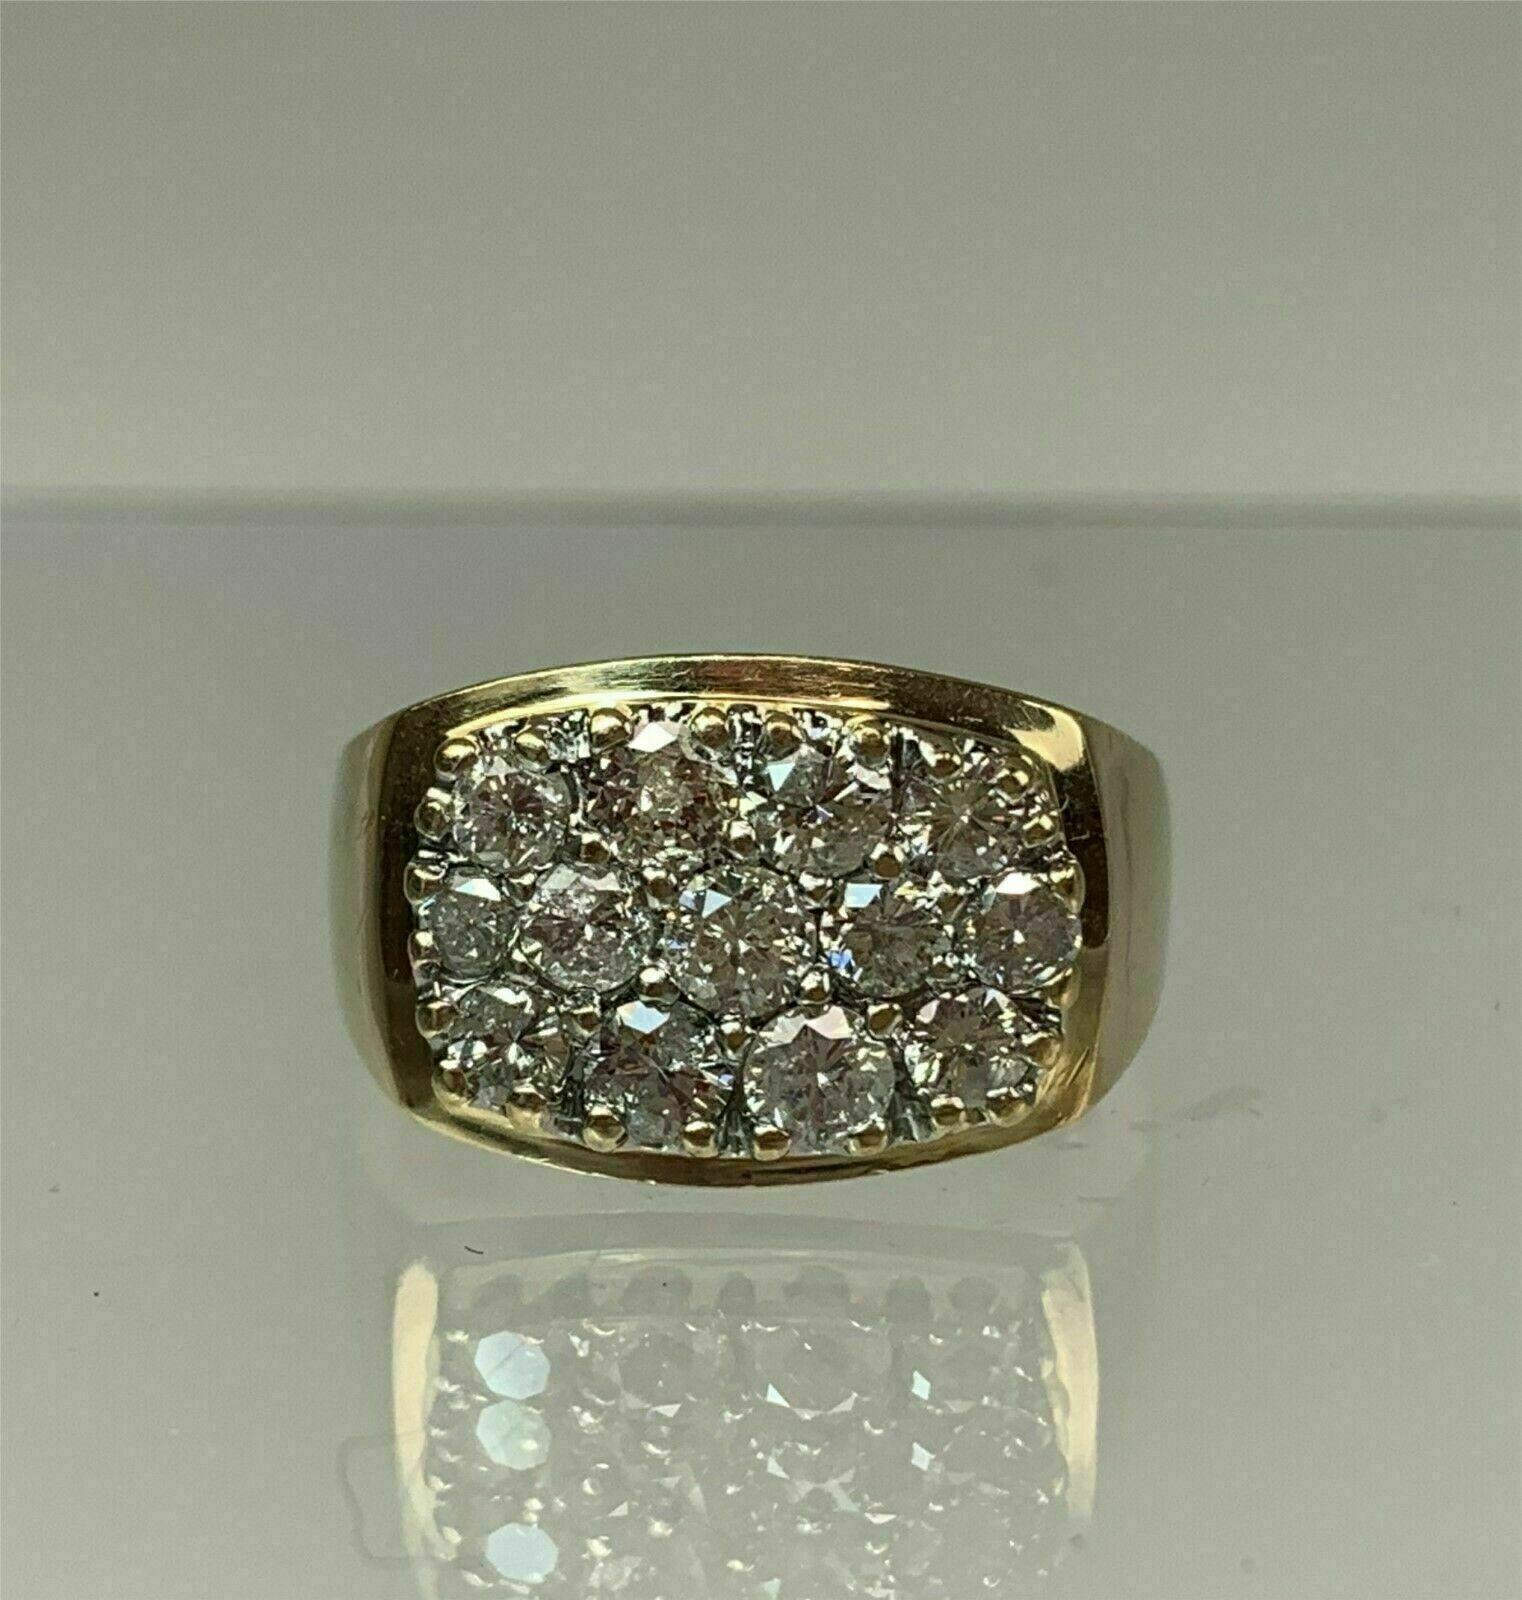 1.50 Ct Round Cut Diamond Gent's Men's Wedding Band Ring 14k Yellow Gold Over 2